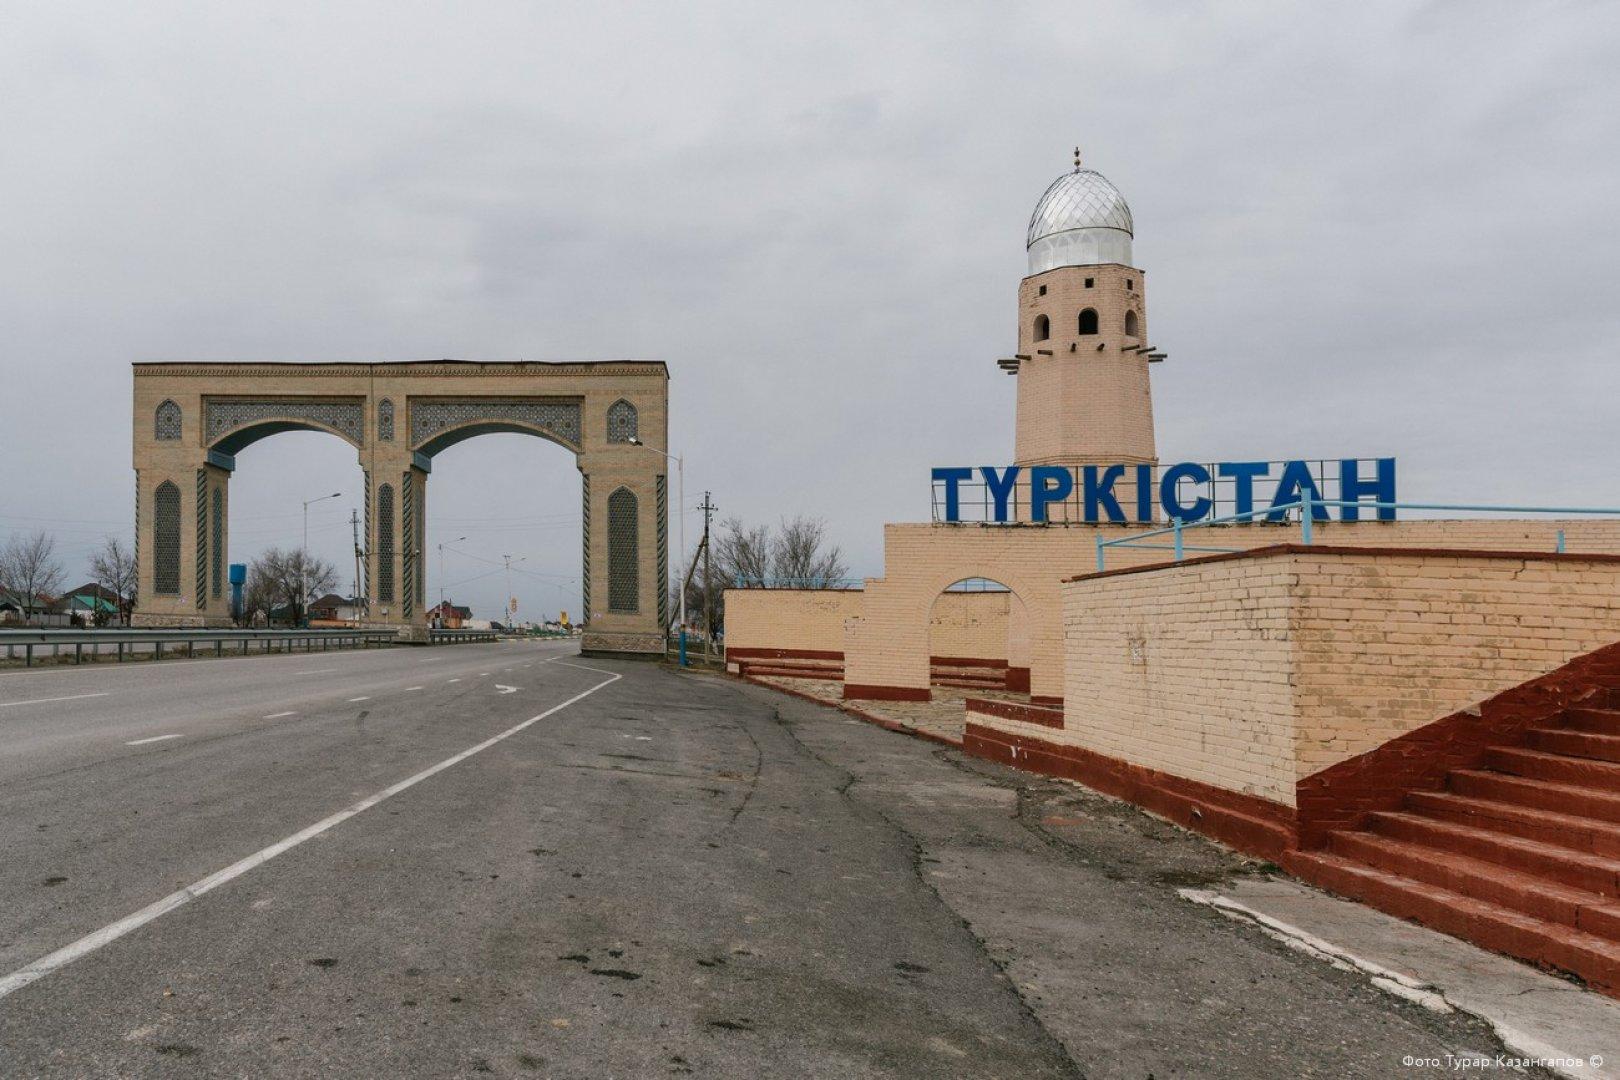 290 рабочих мест создали на заводах Туркестана